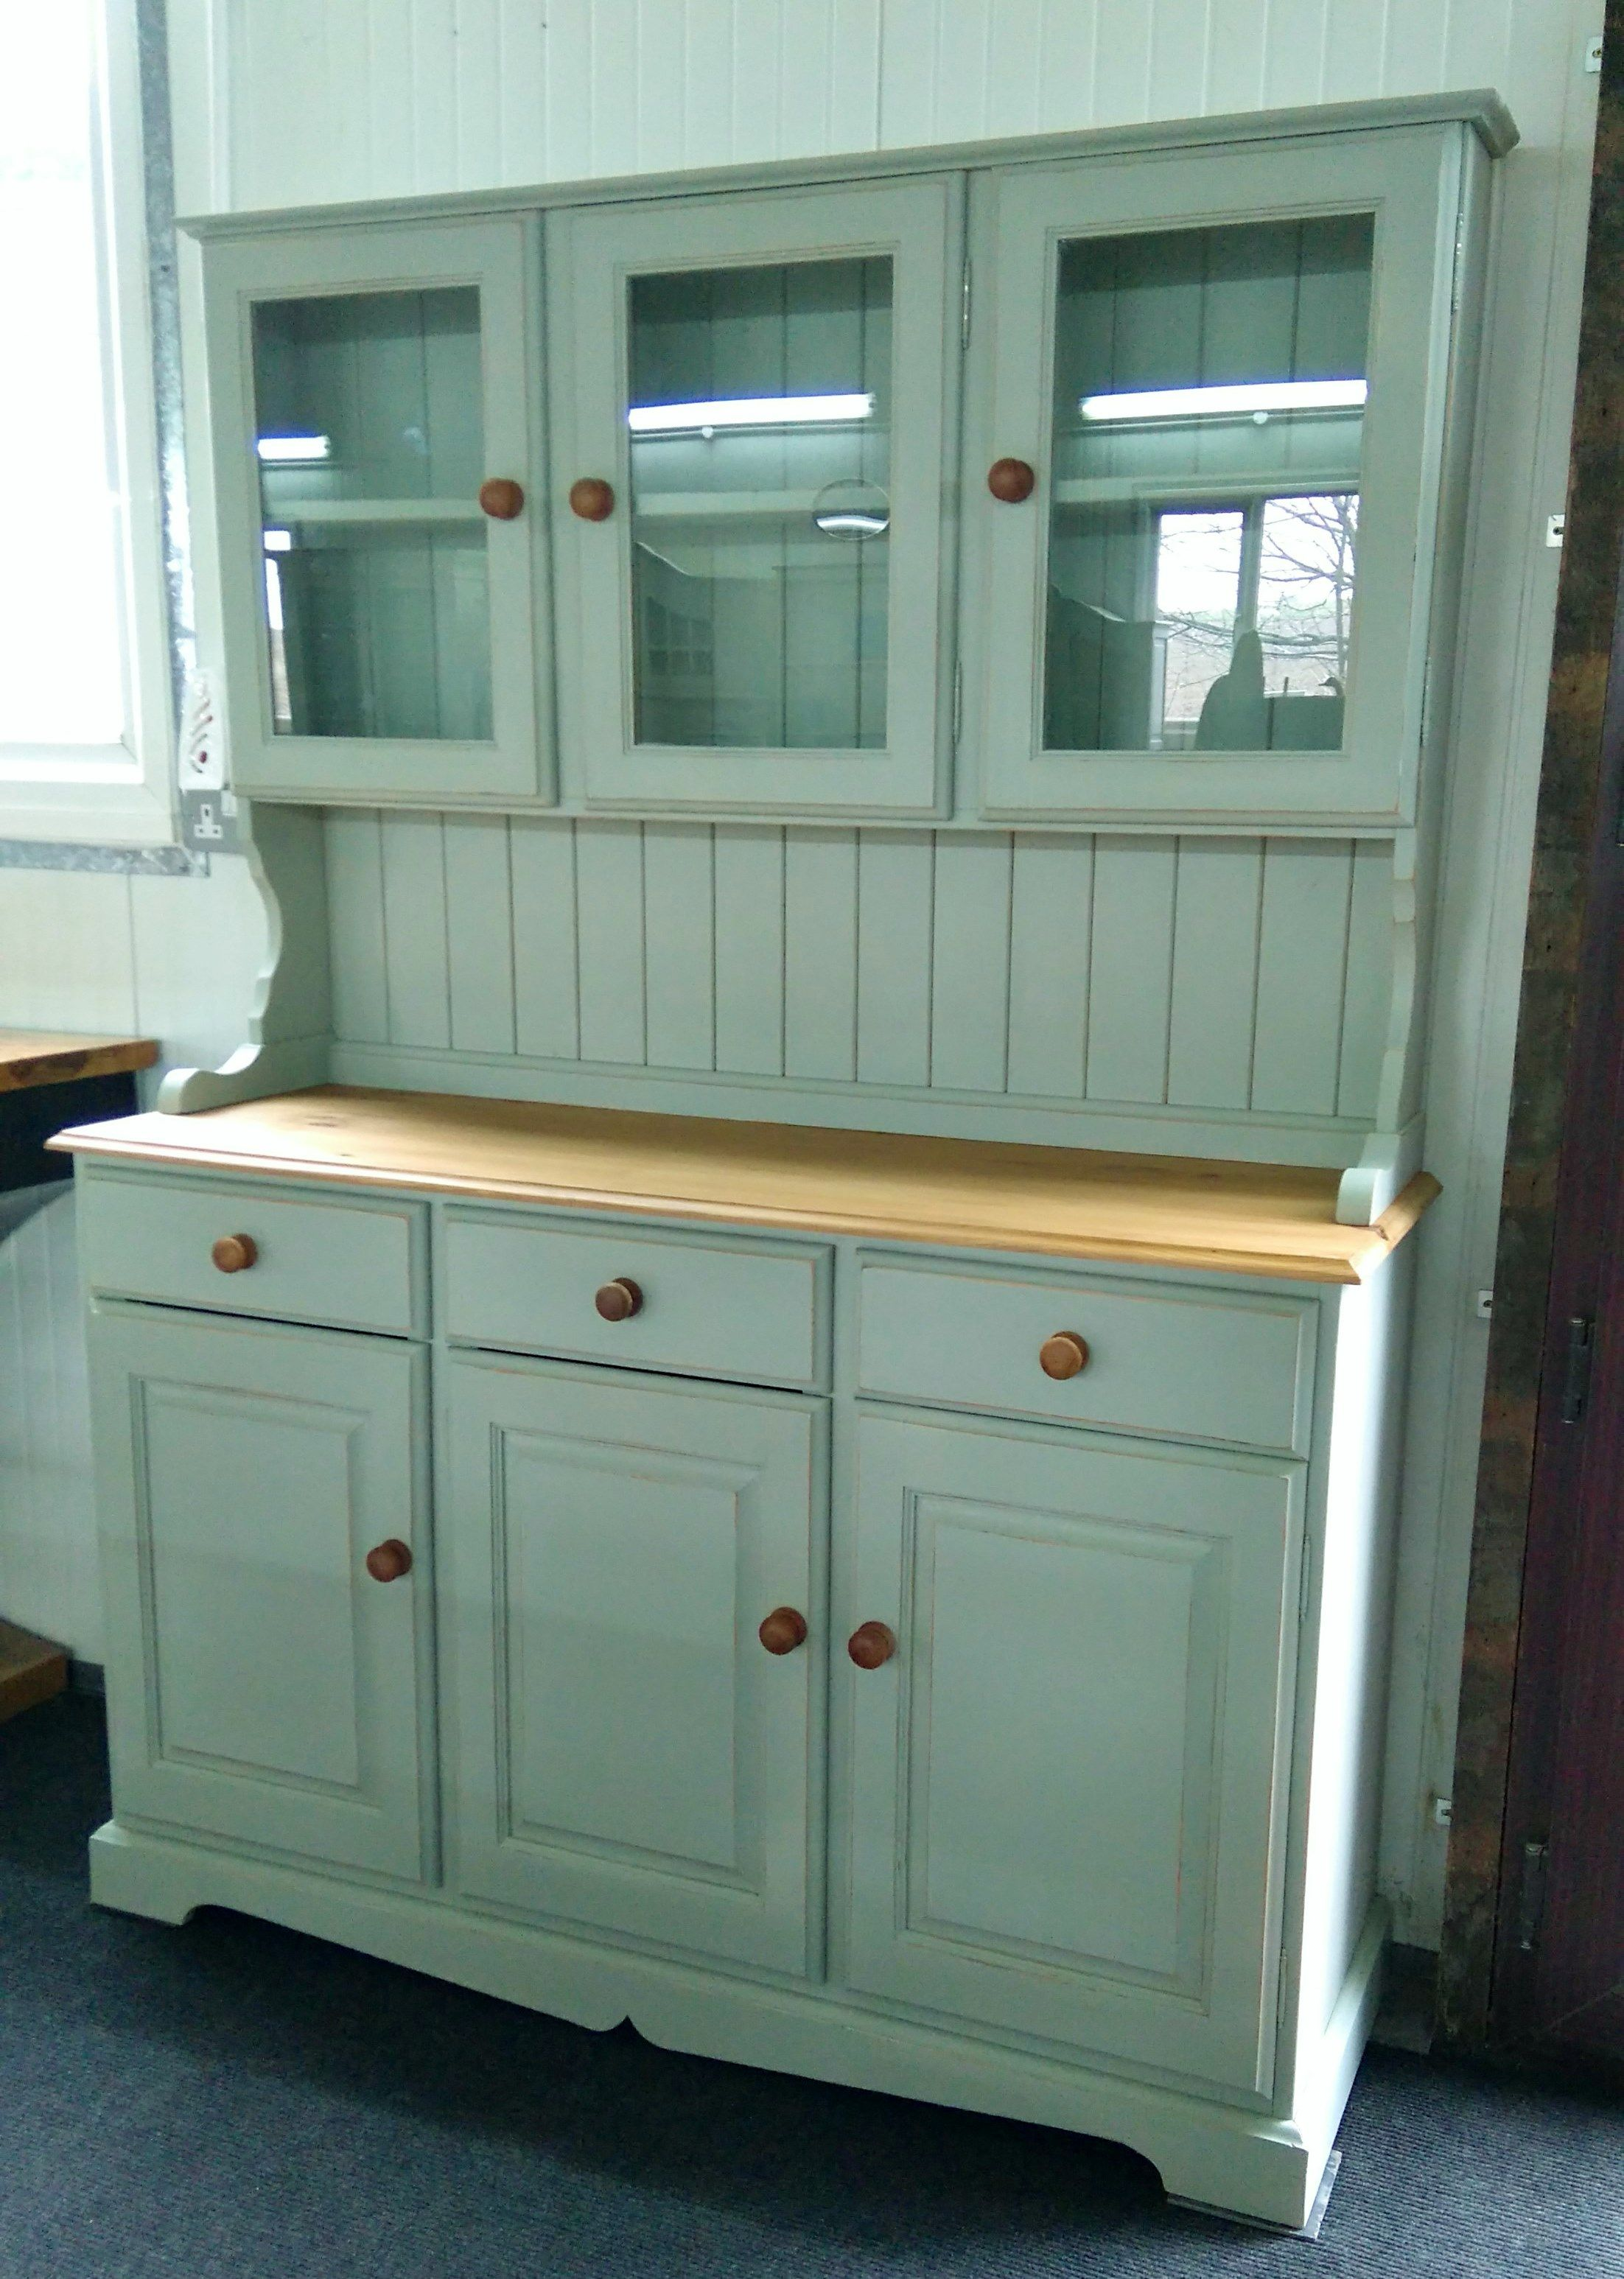 Pine glazed 4FT 6 wide dresser painted